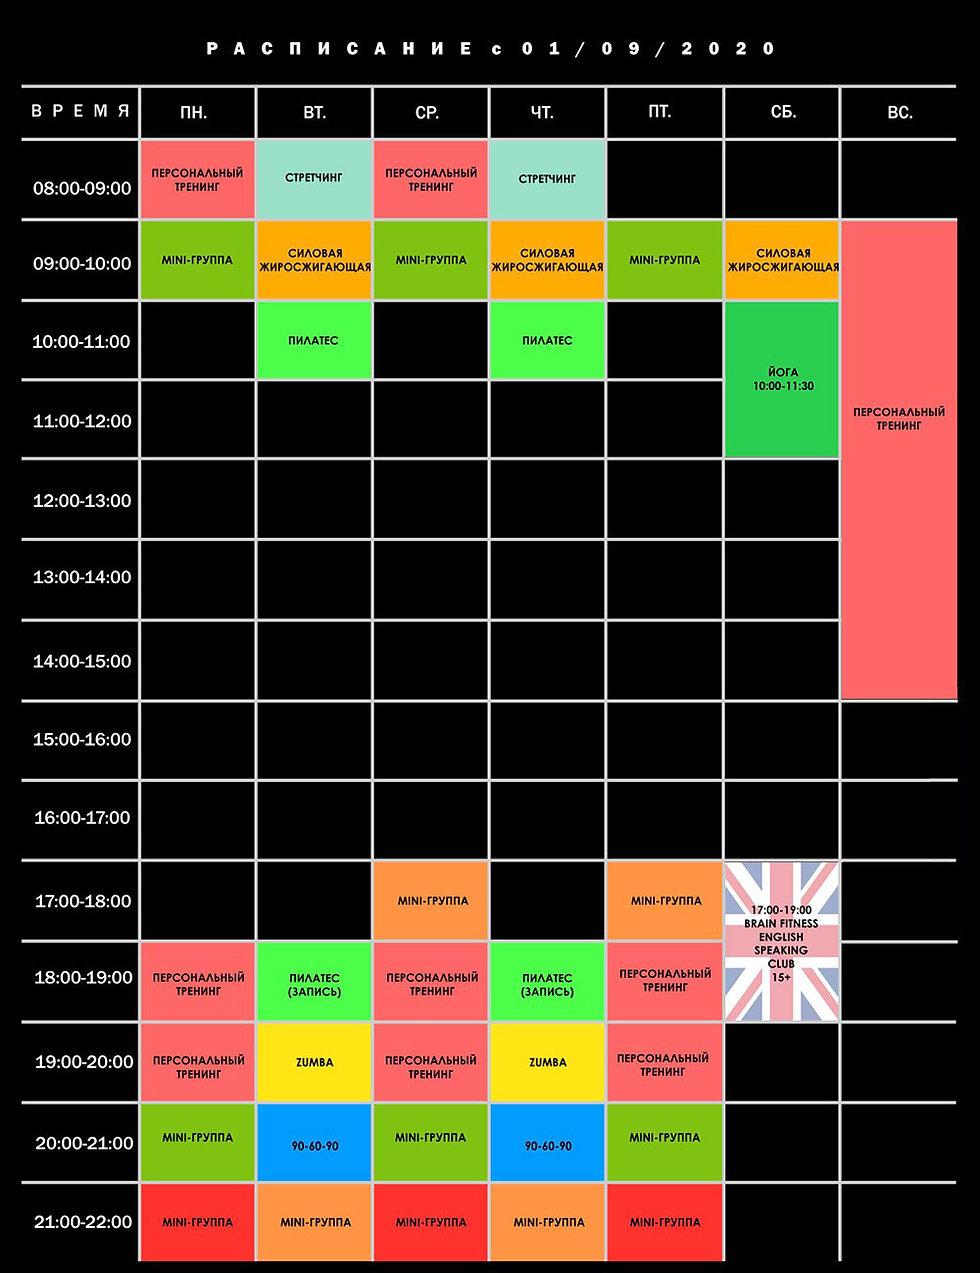 Timetable-20-8-21www.jpg